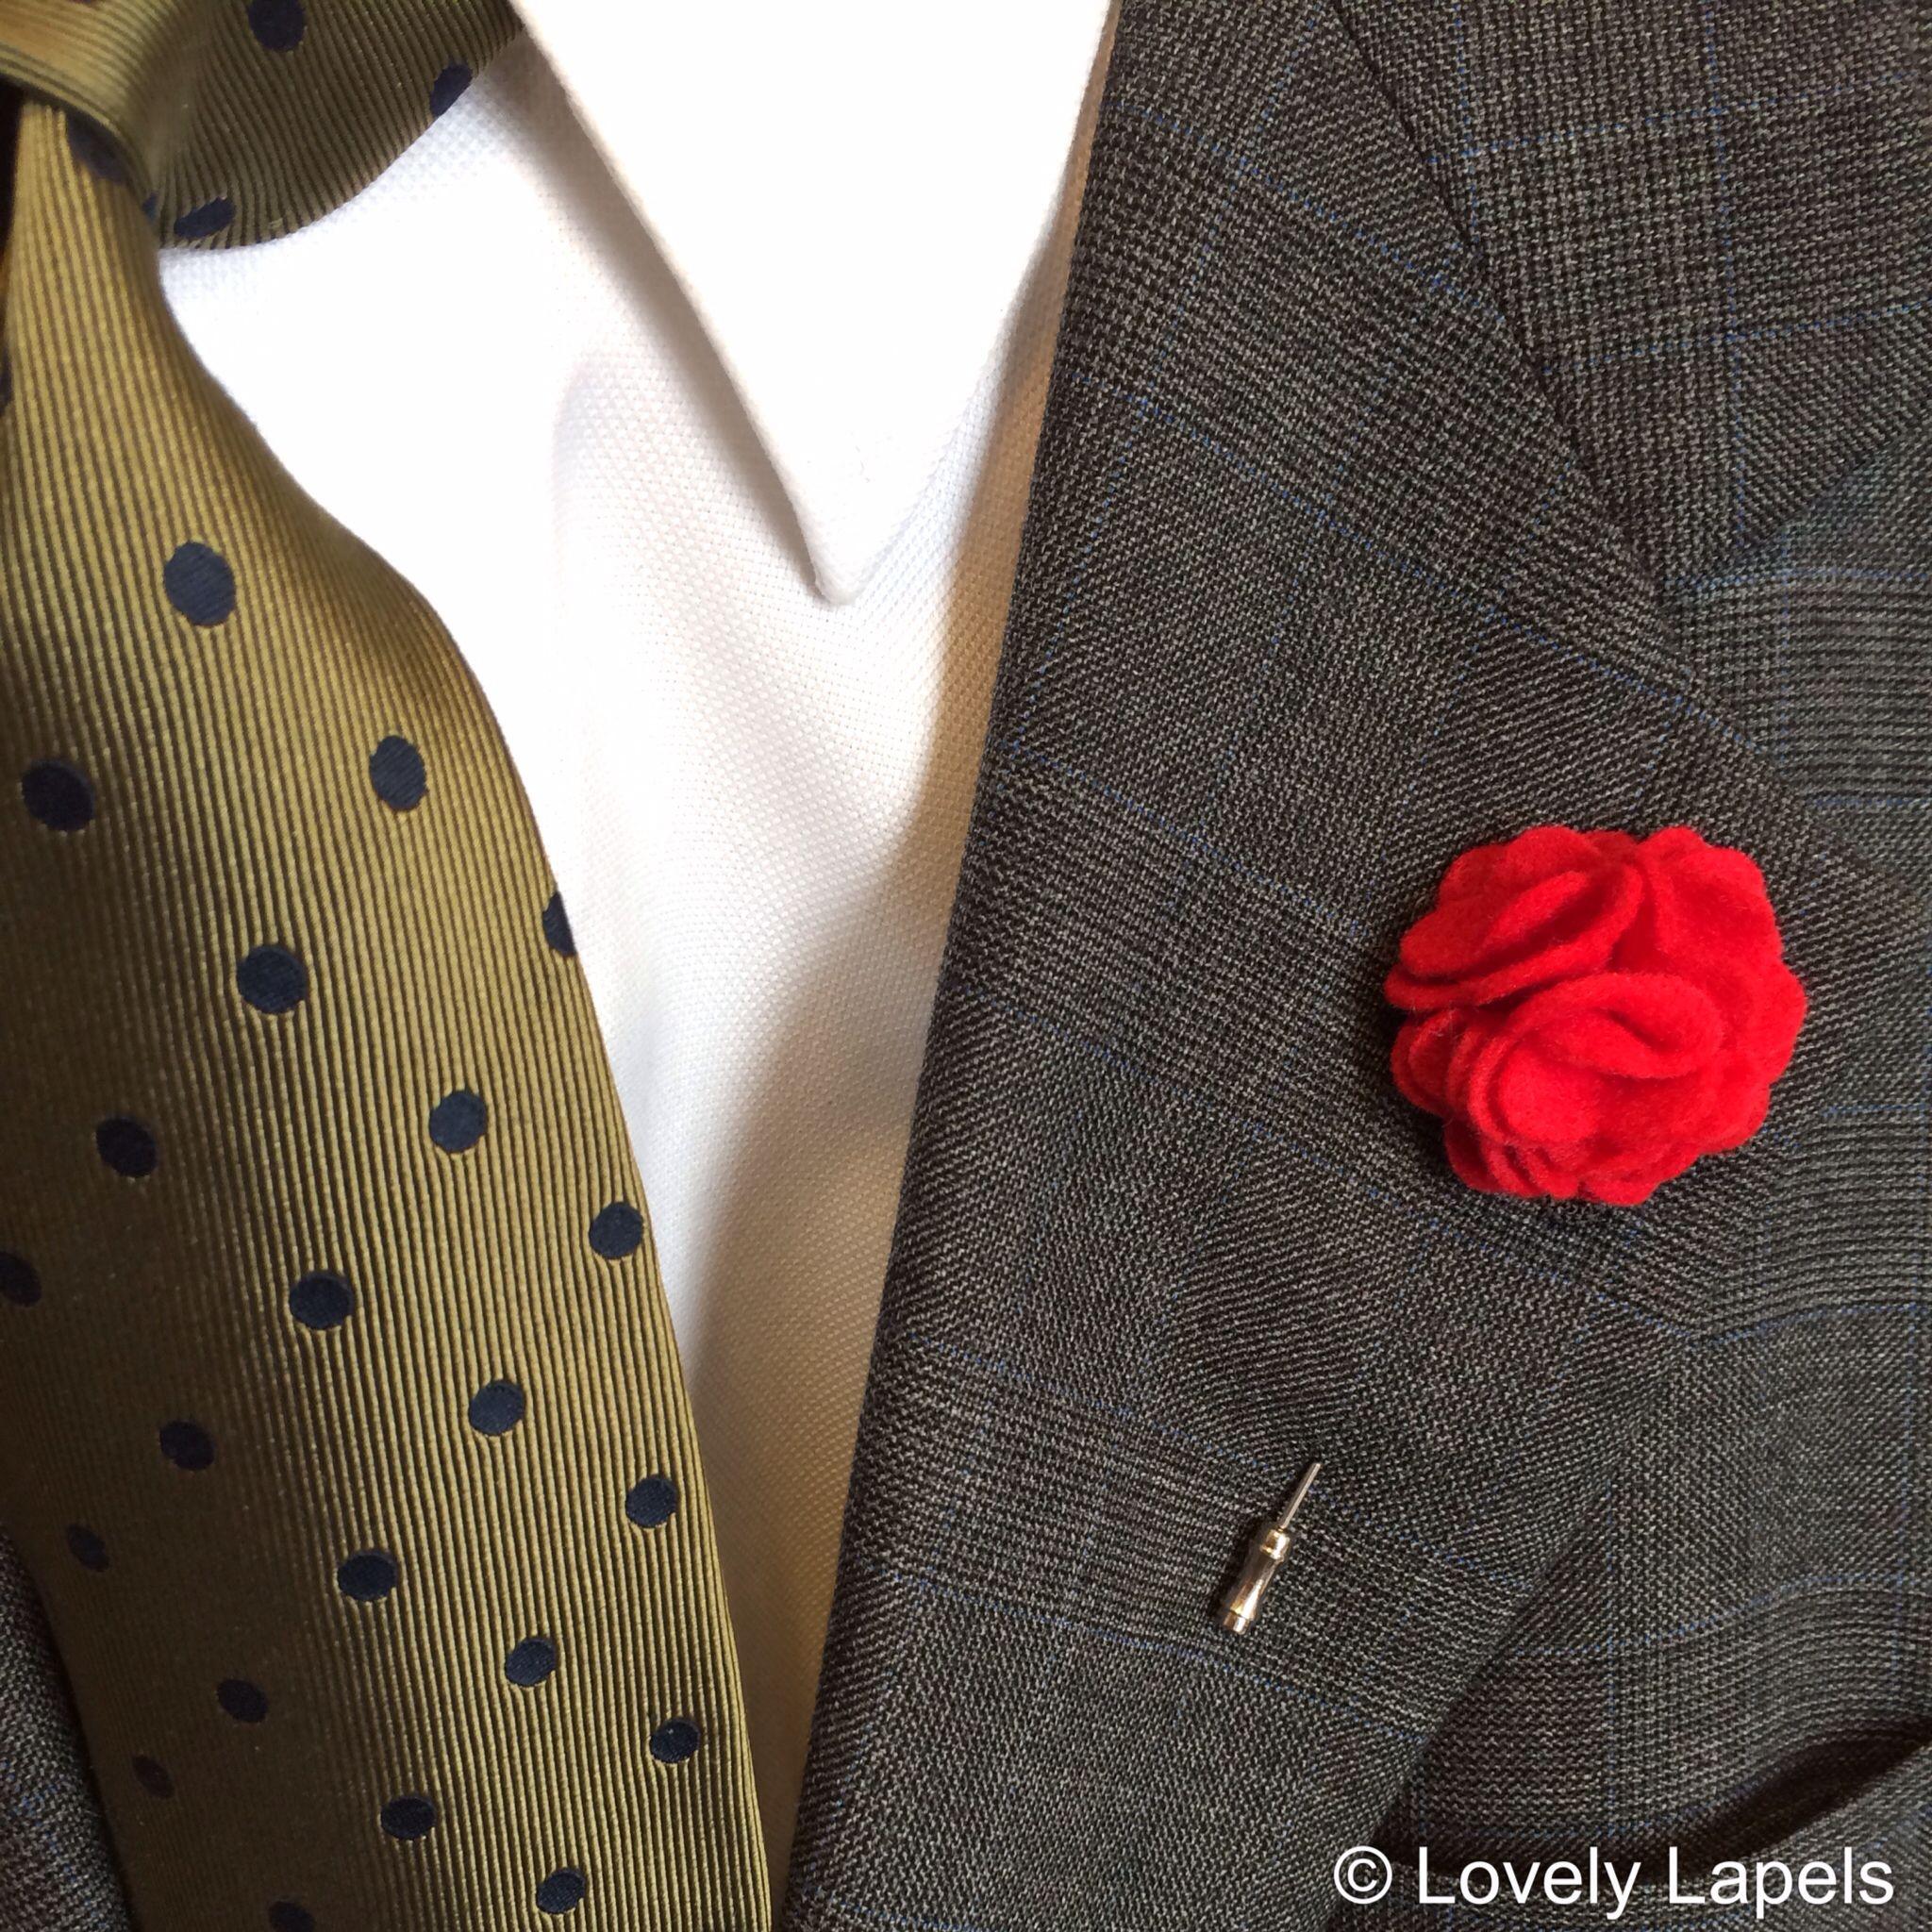 Felt flower red men's lapel flowers men's fashion accessories spring summer 2014 boutinerres